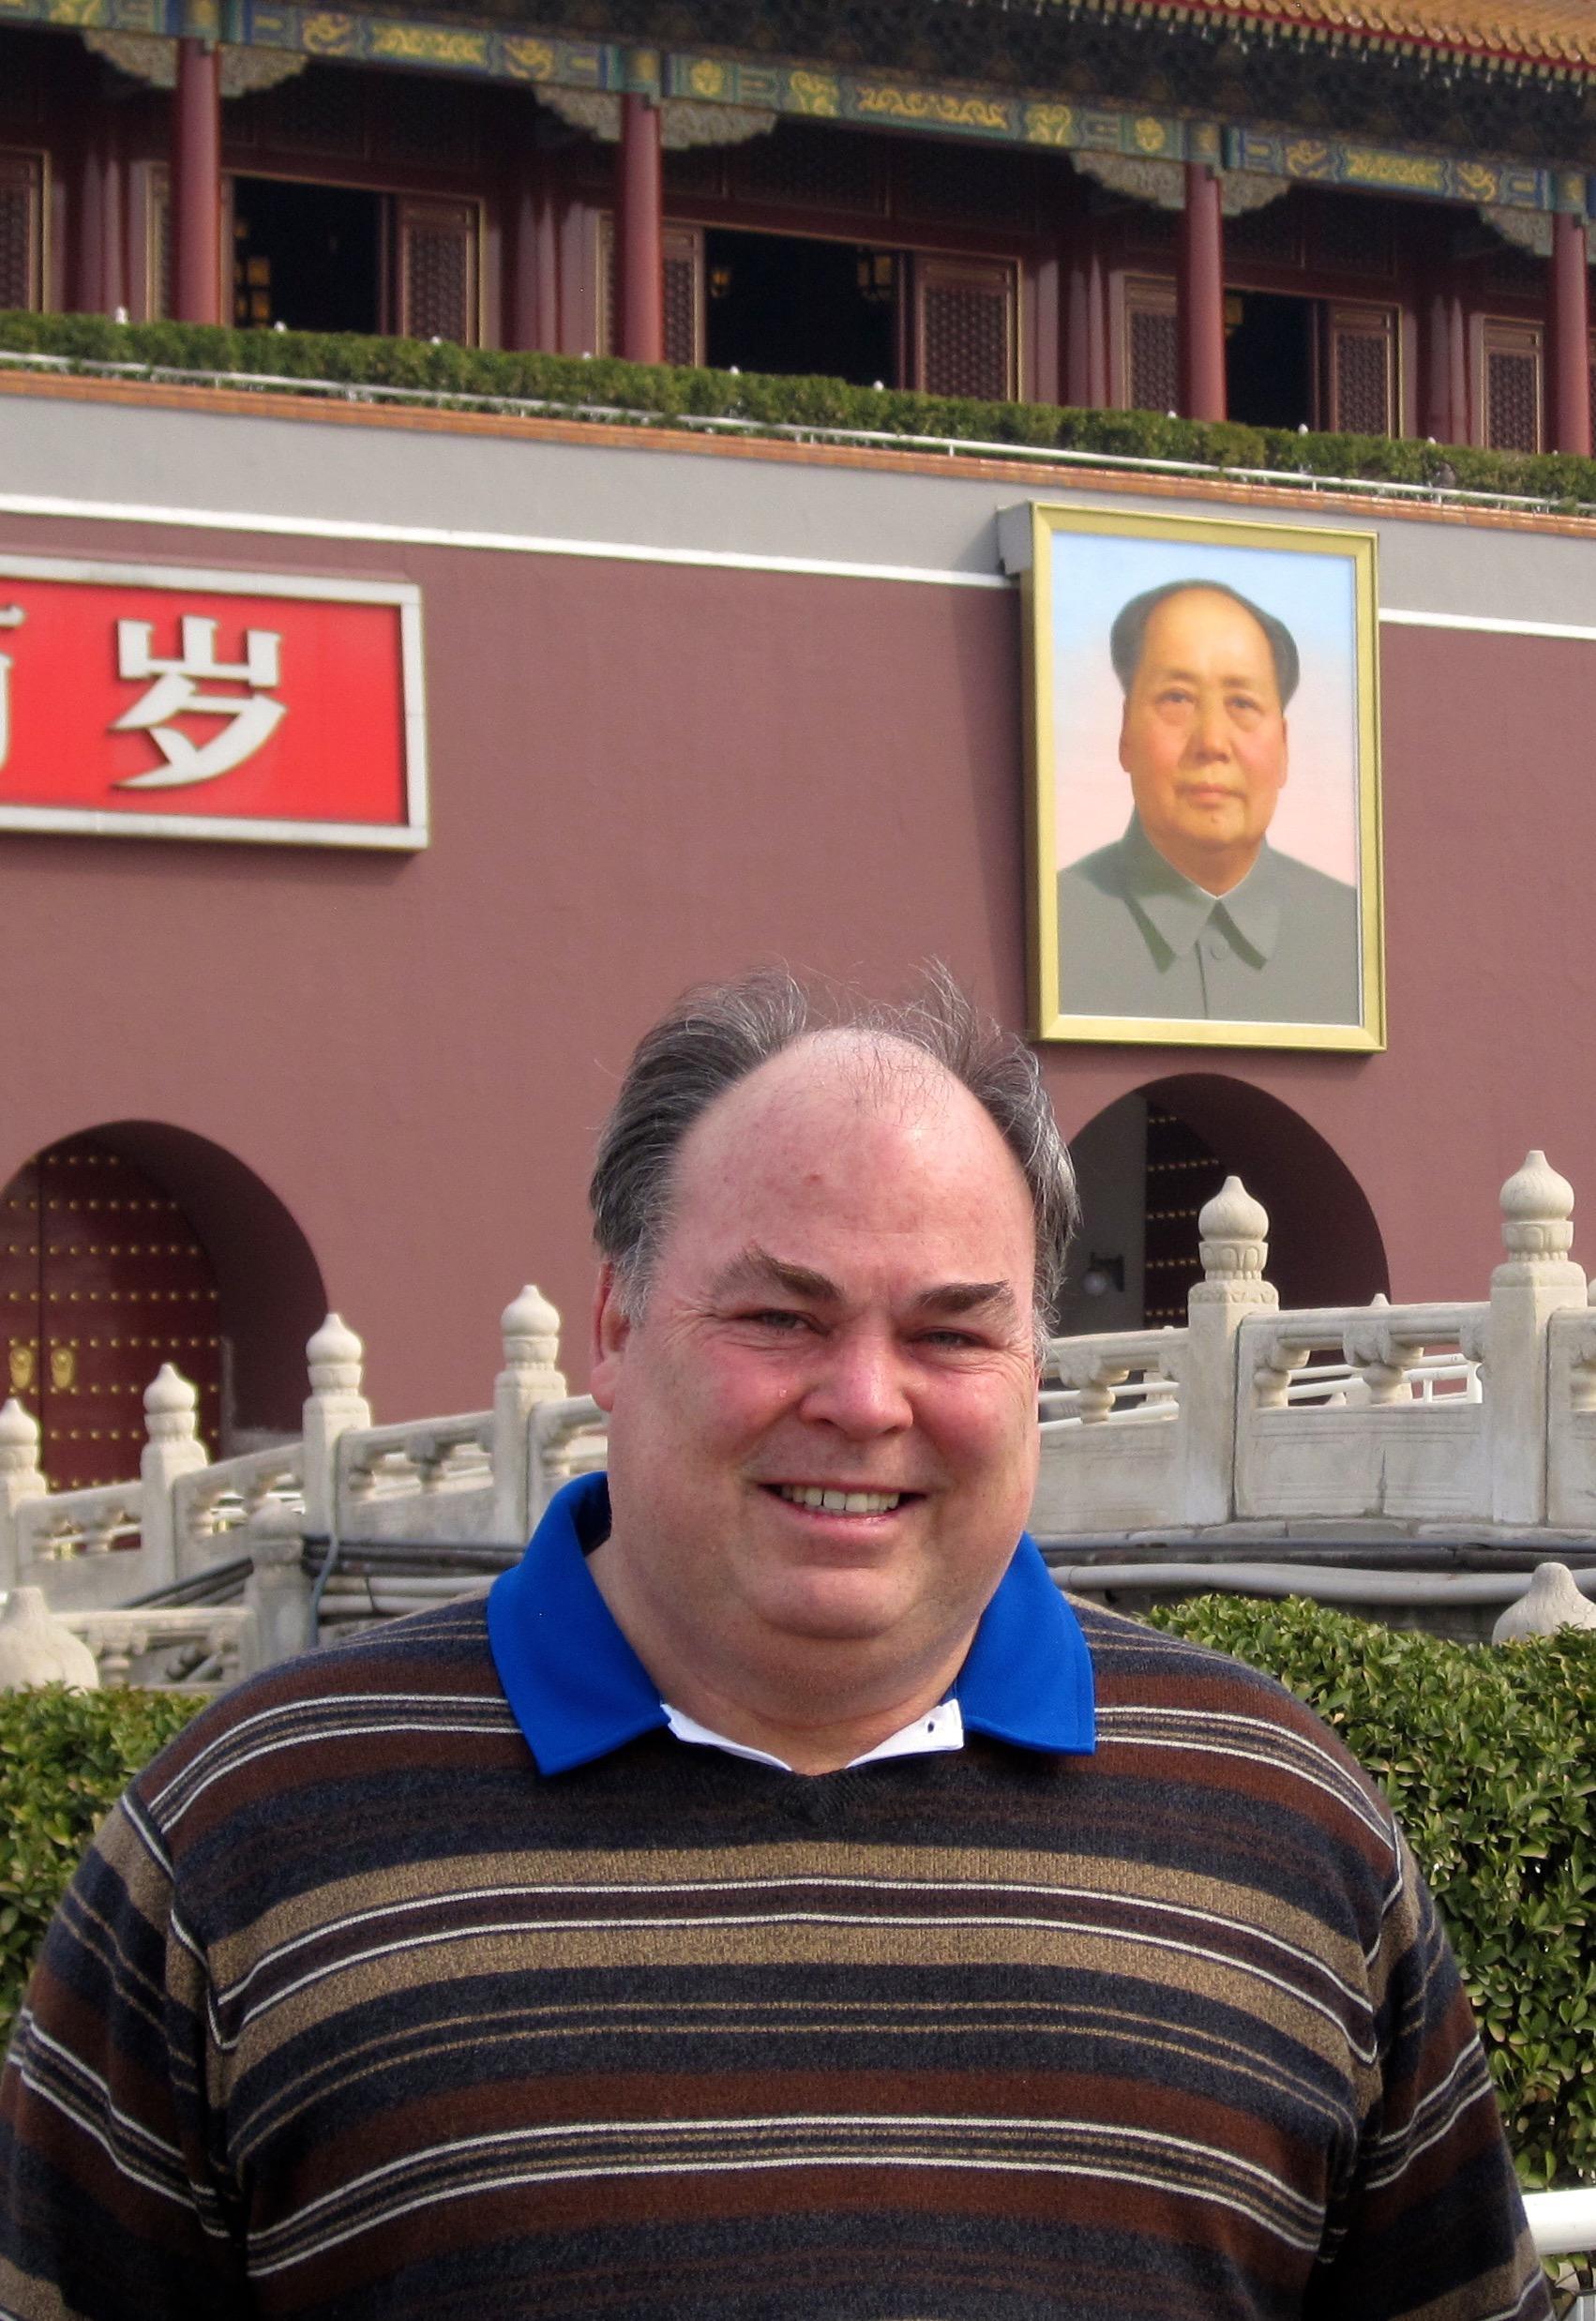 At Tiananmen Square, Beijing